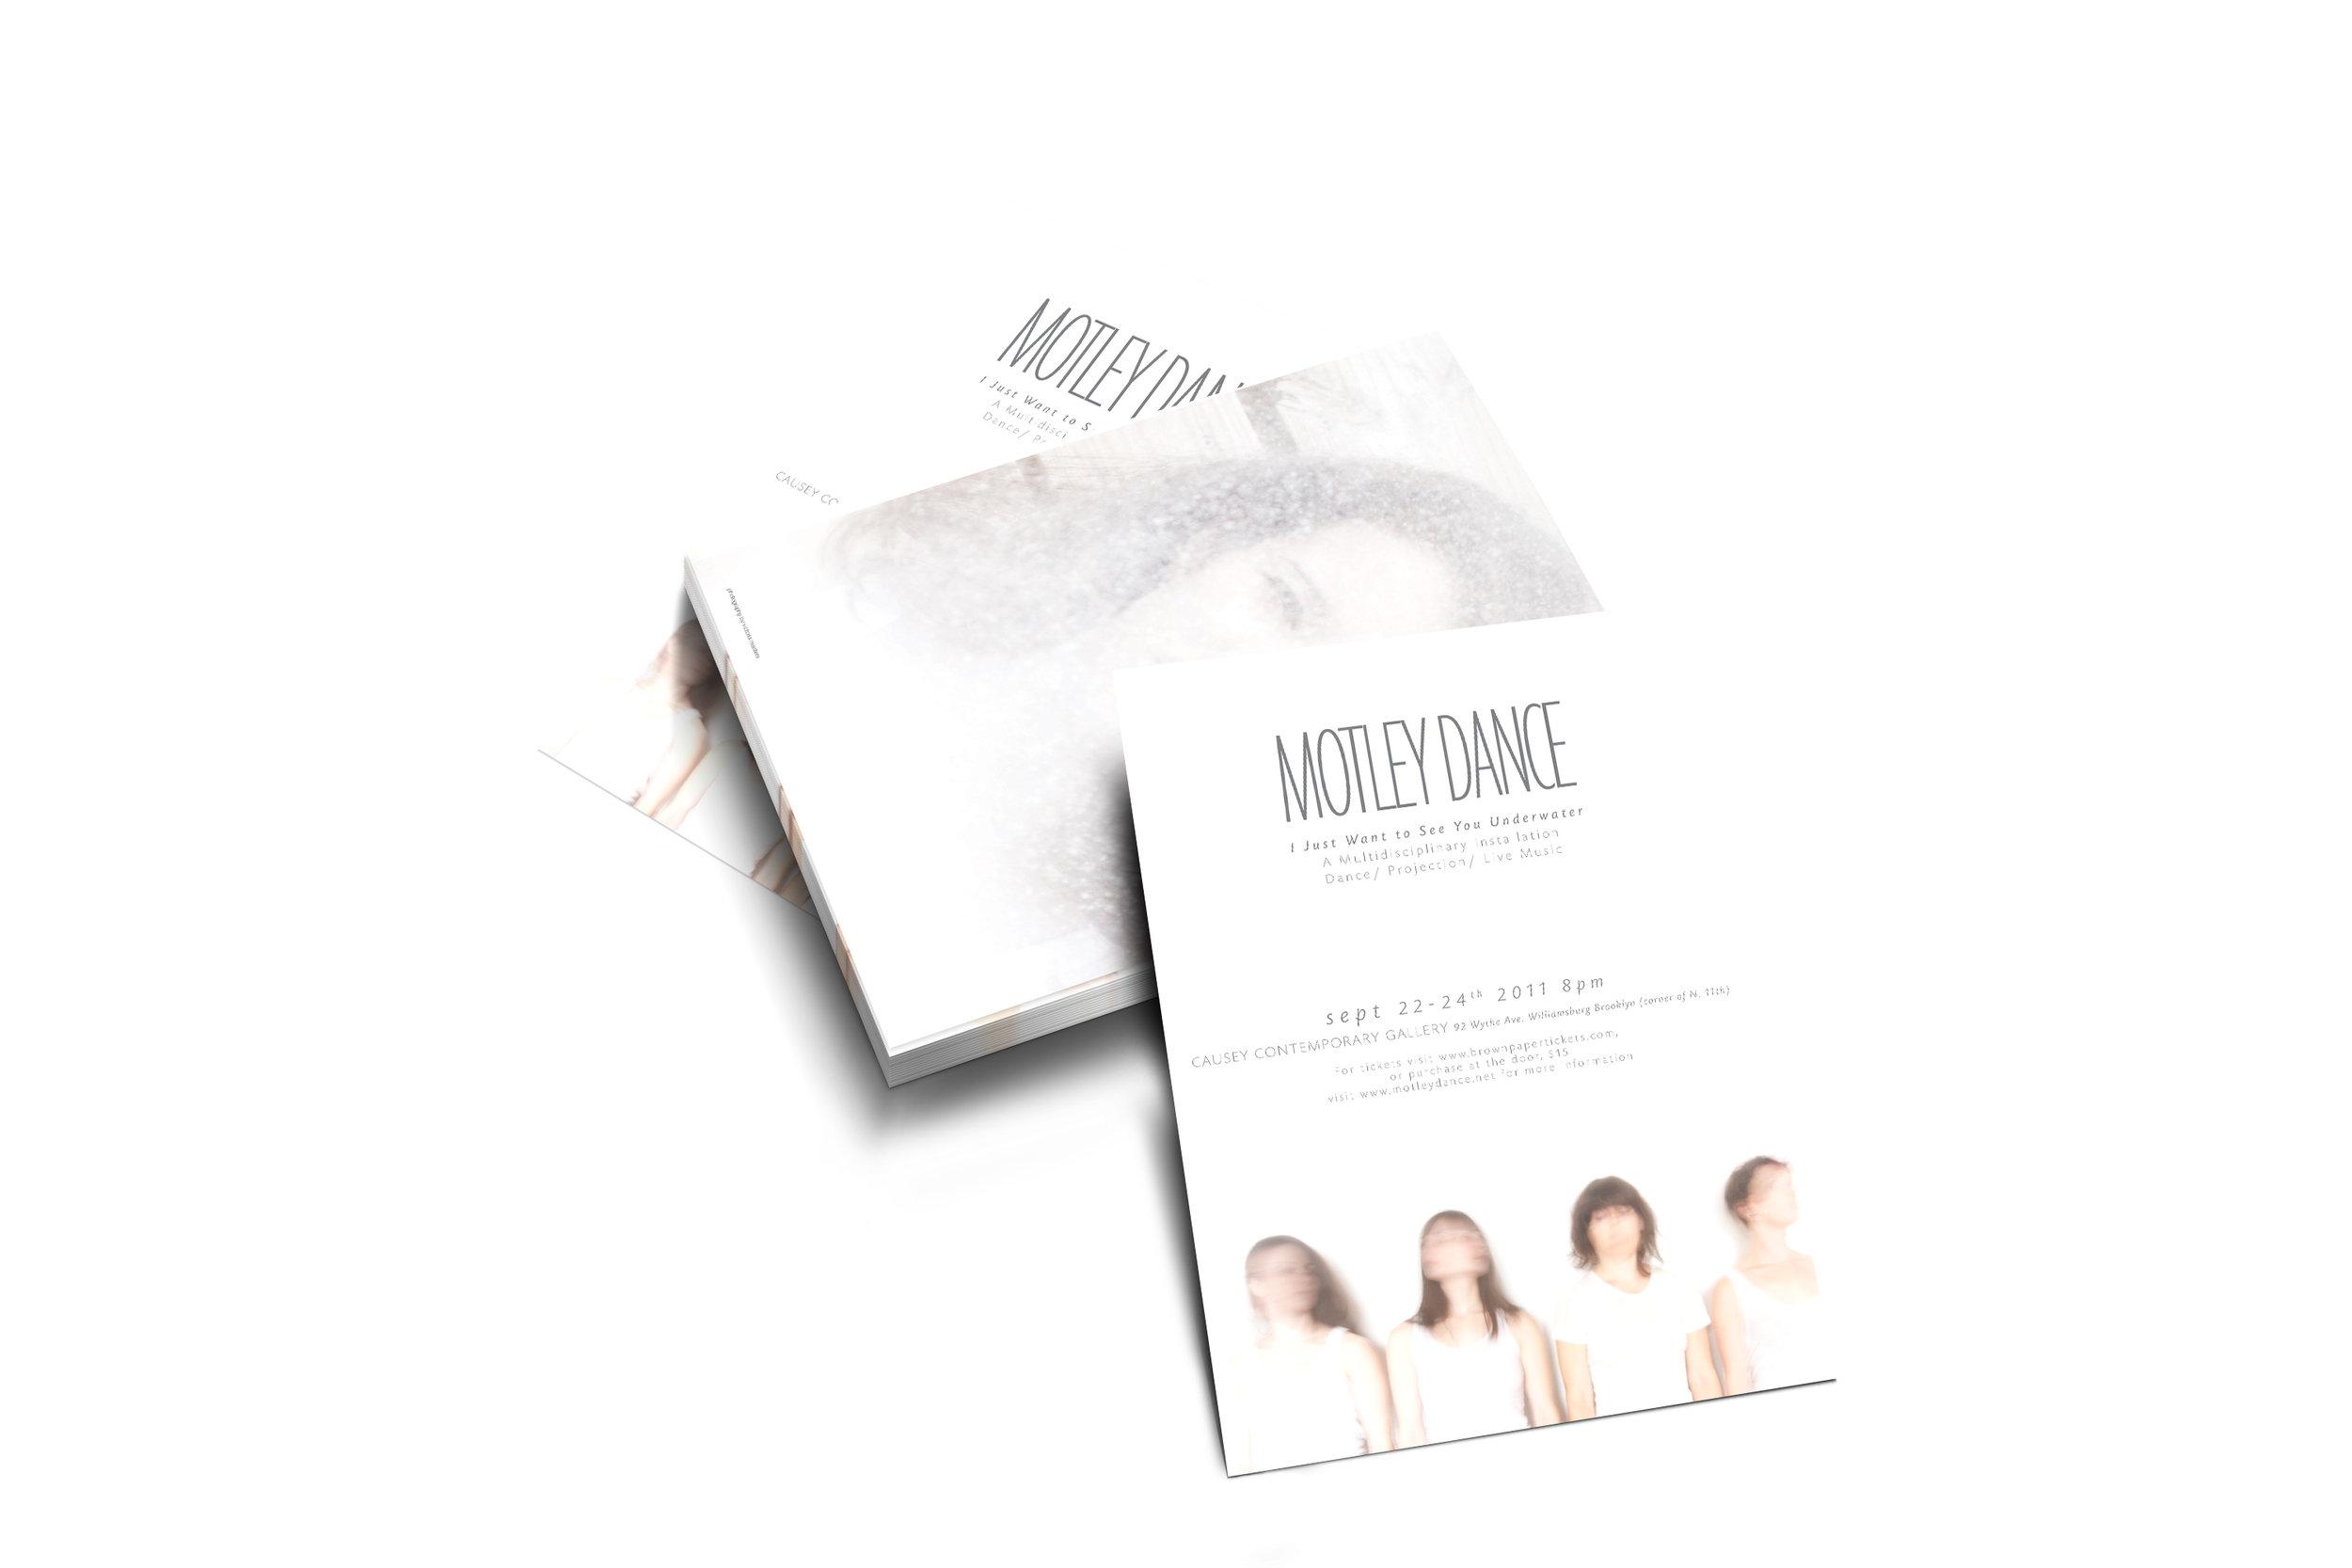 motley-dance-postcards.jpg